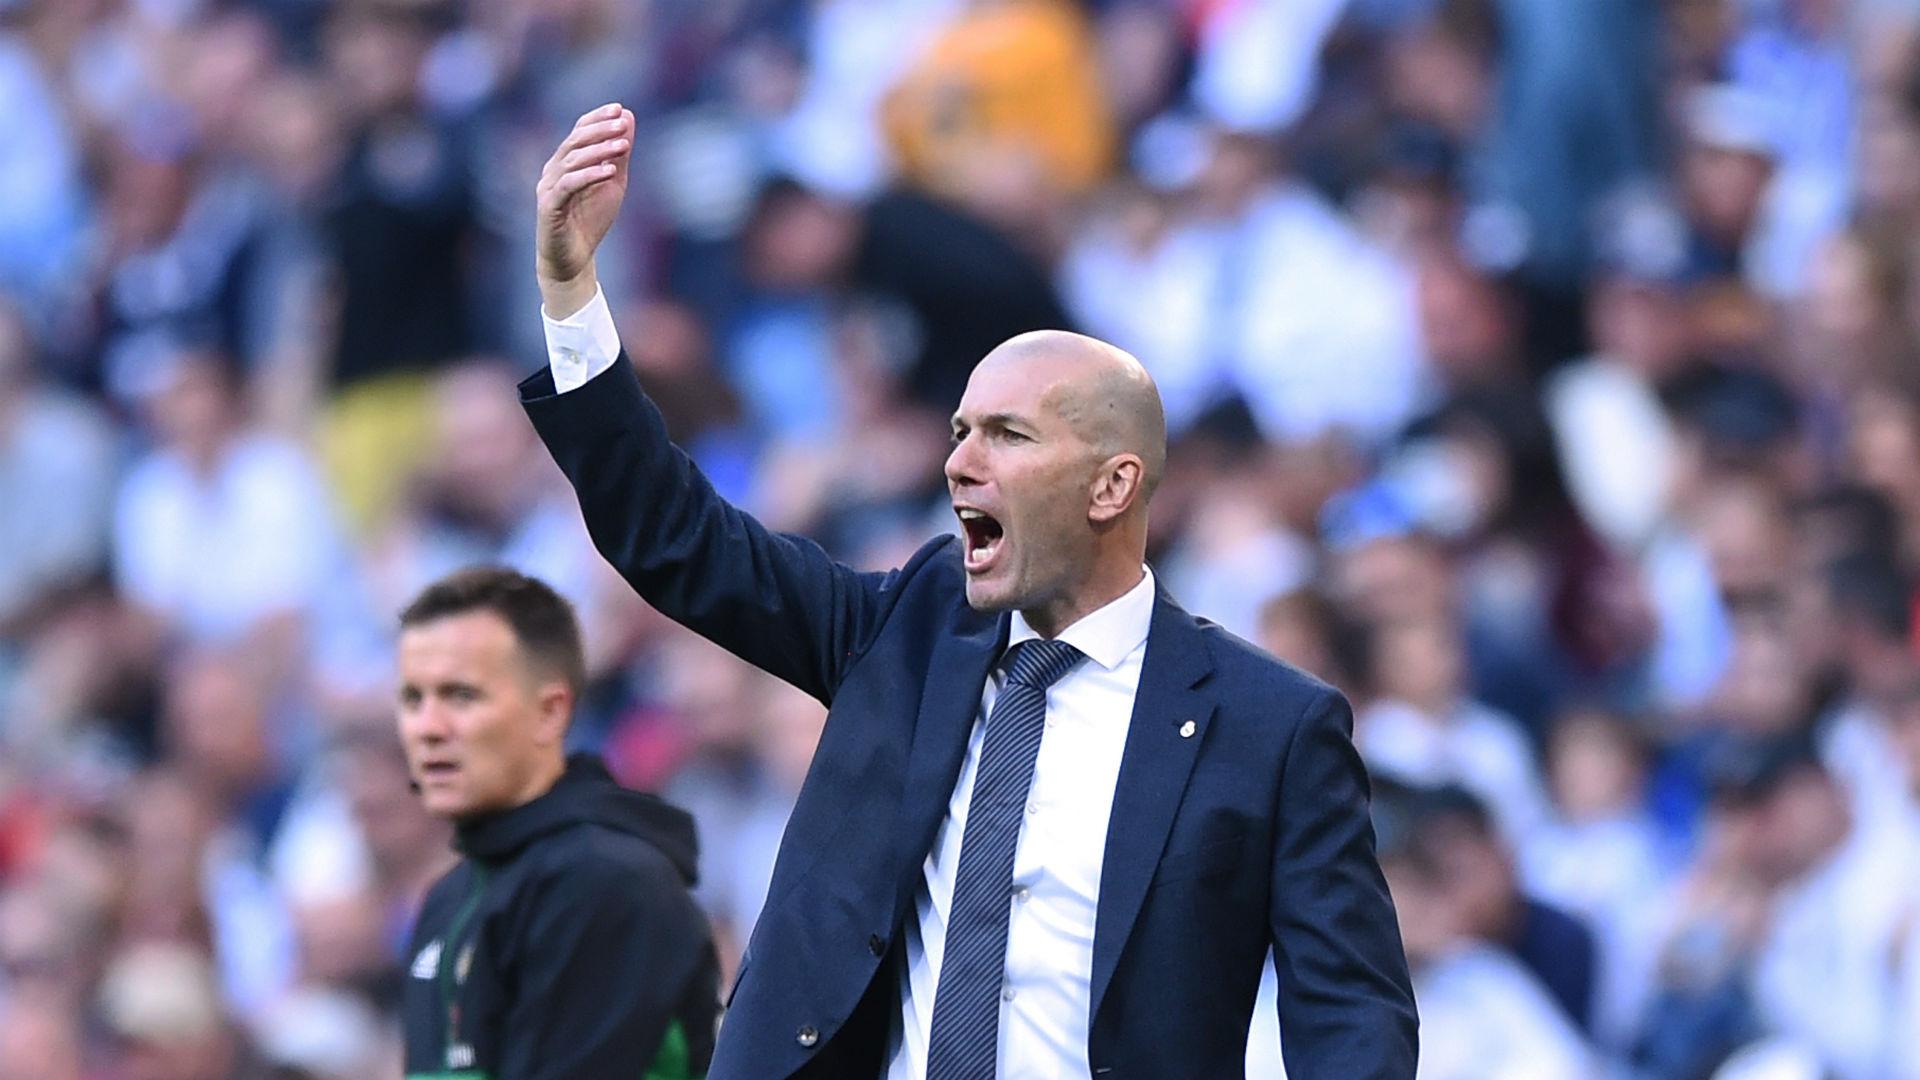 Casillas thrilled by Zidane's Real Madrid return